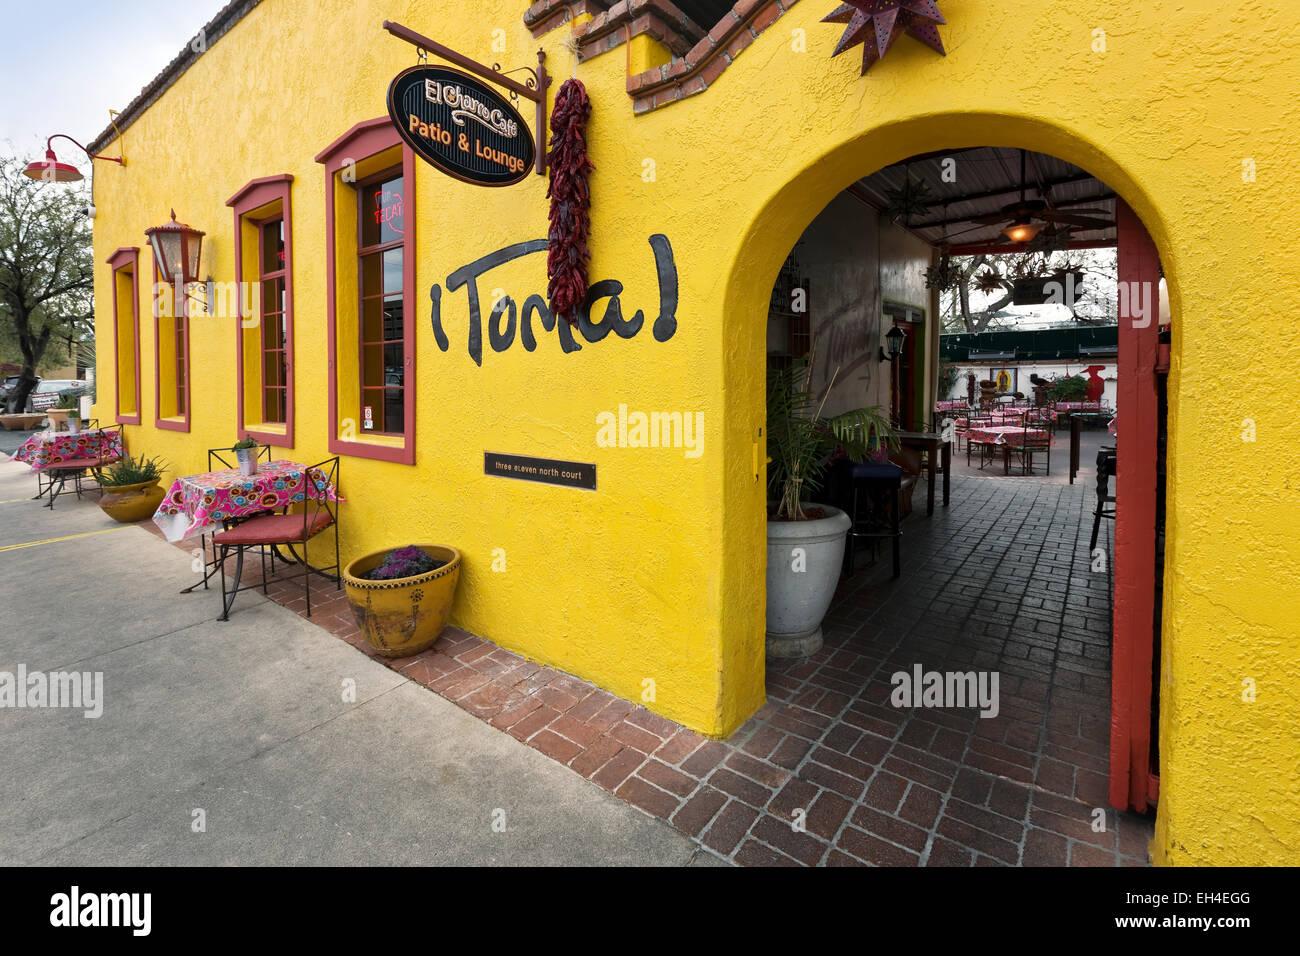 El Charro Mexican Restaurant Tucson Arizona Stock Photo 79389872